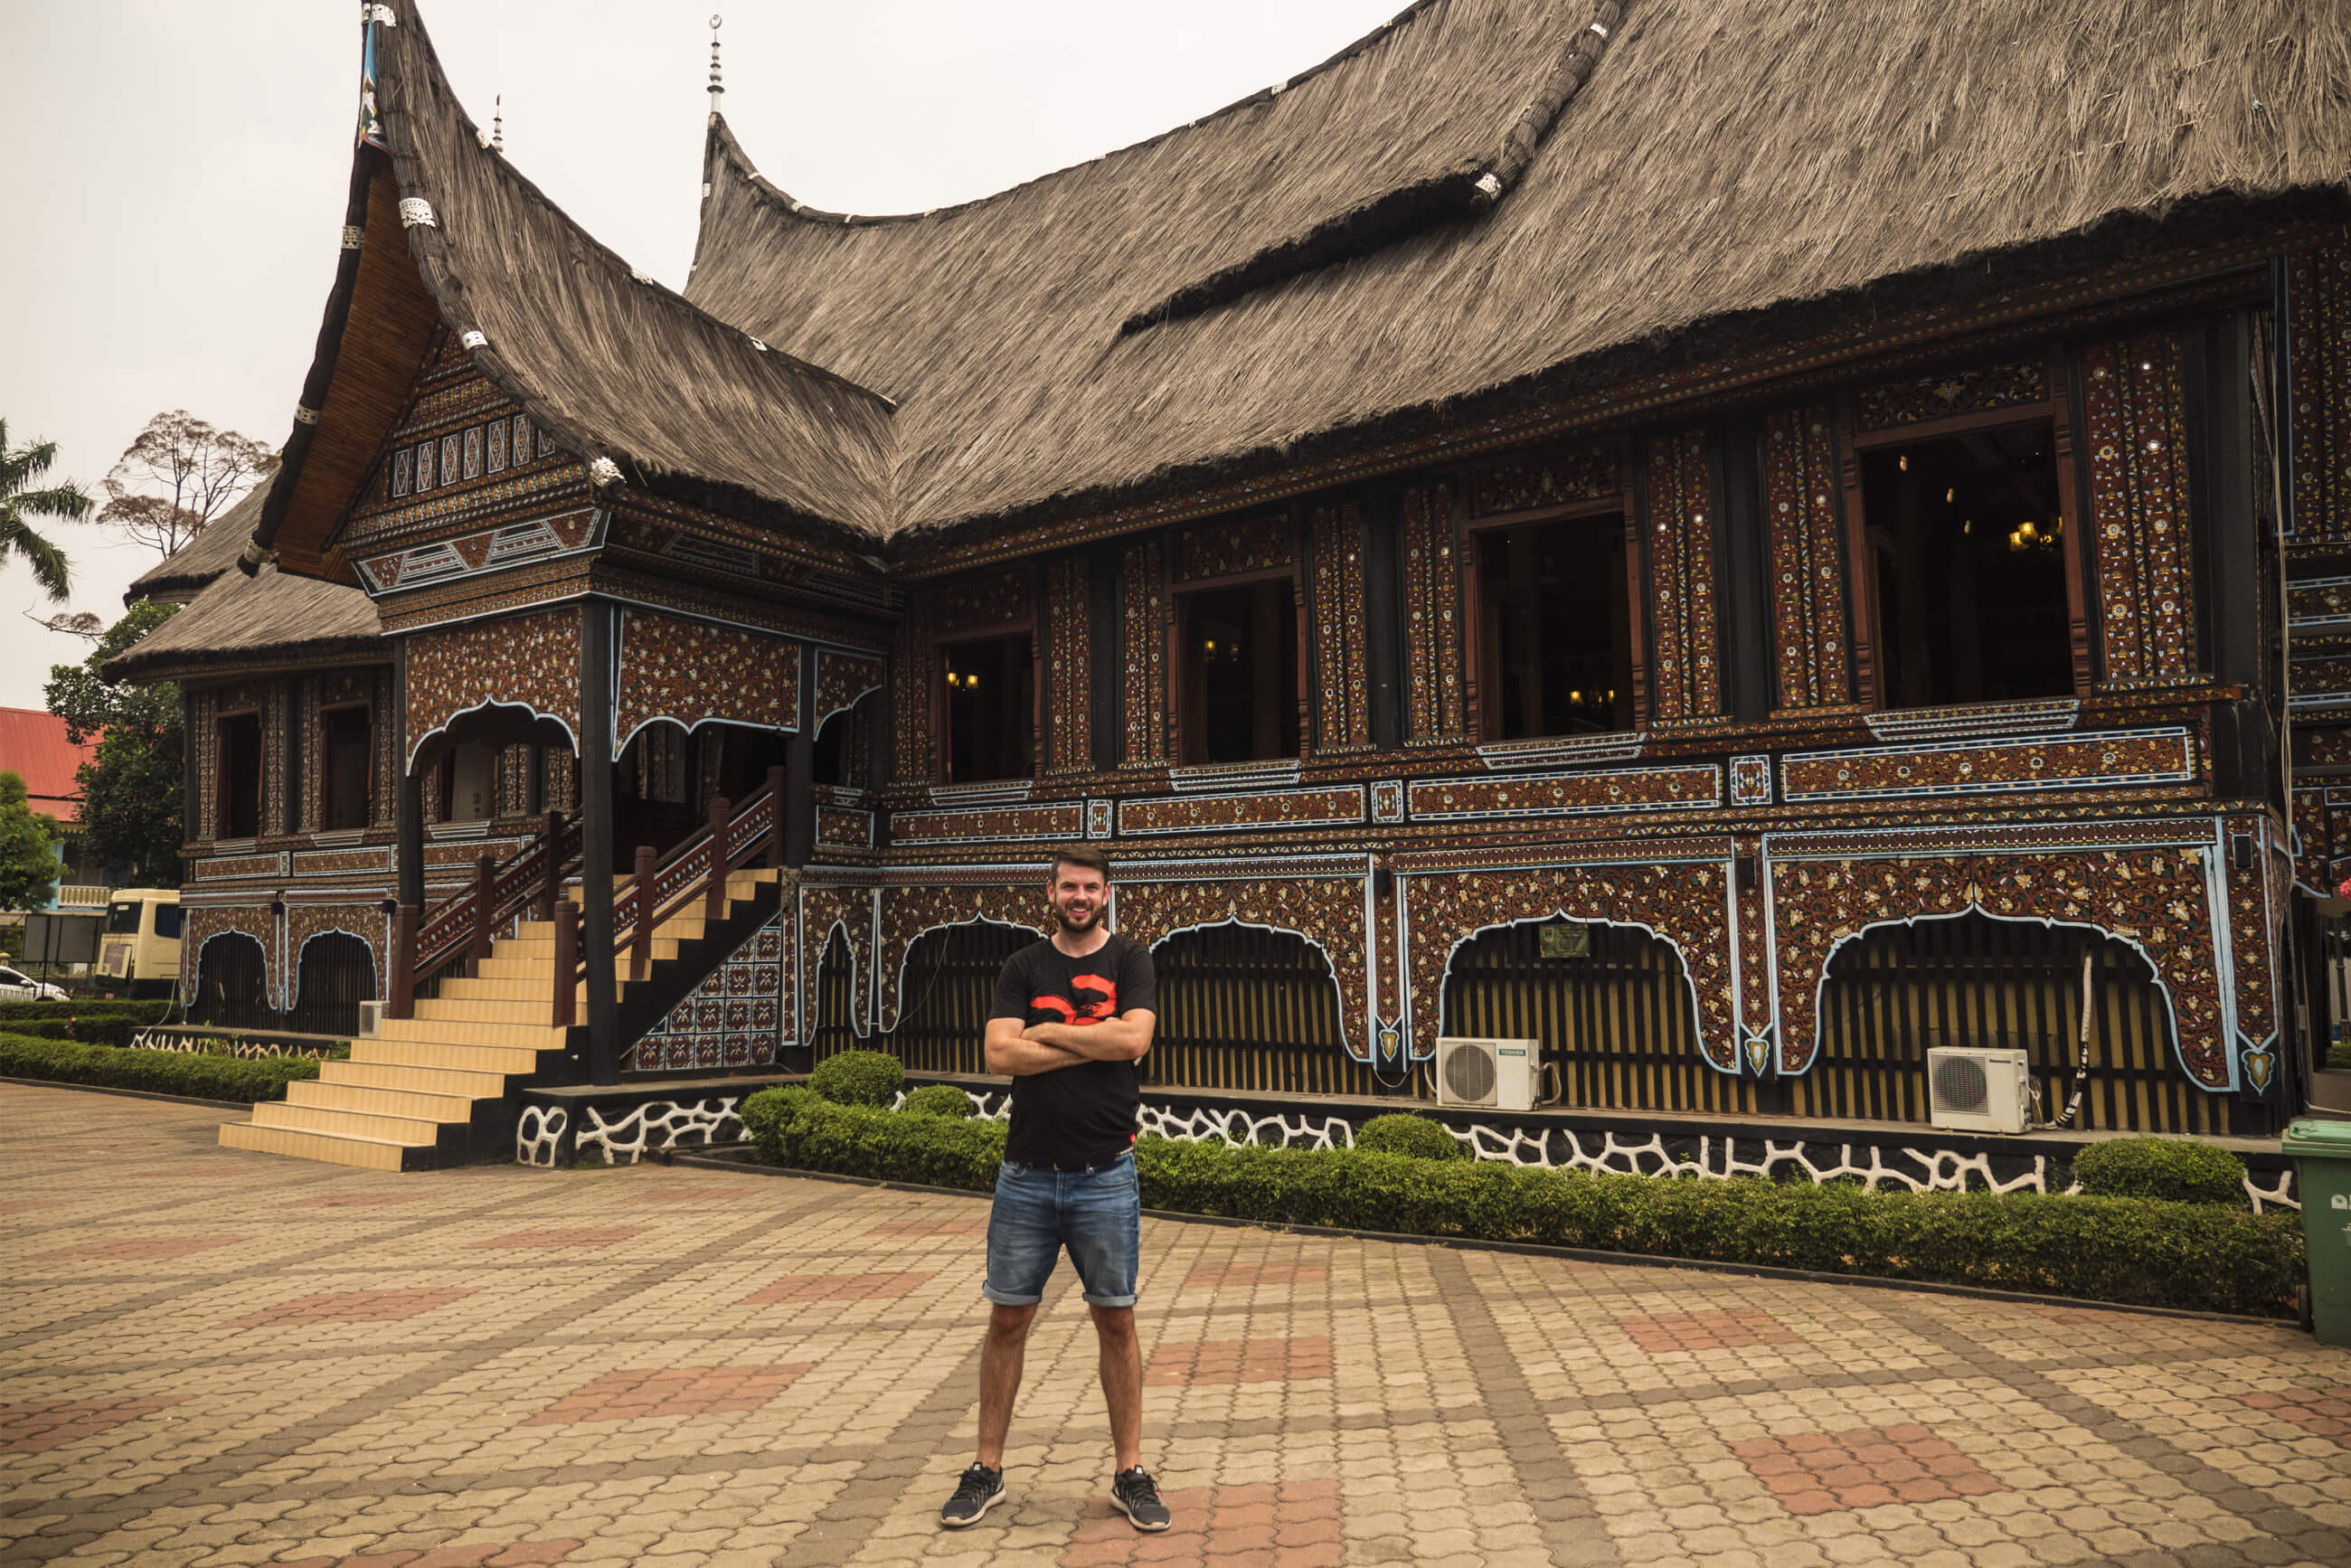 https://bubo.sk/uploads/galleries/7304/martin_simko_indonezia_java.jpg